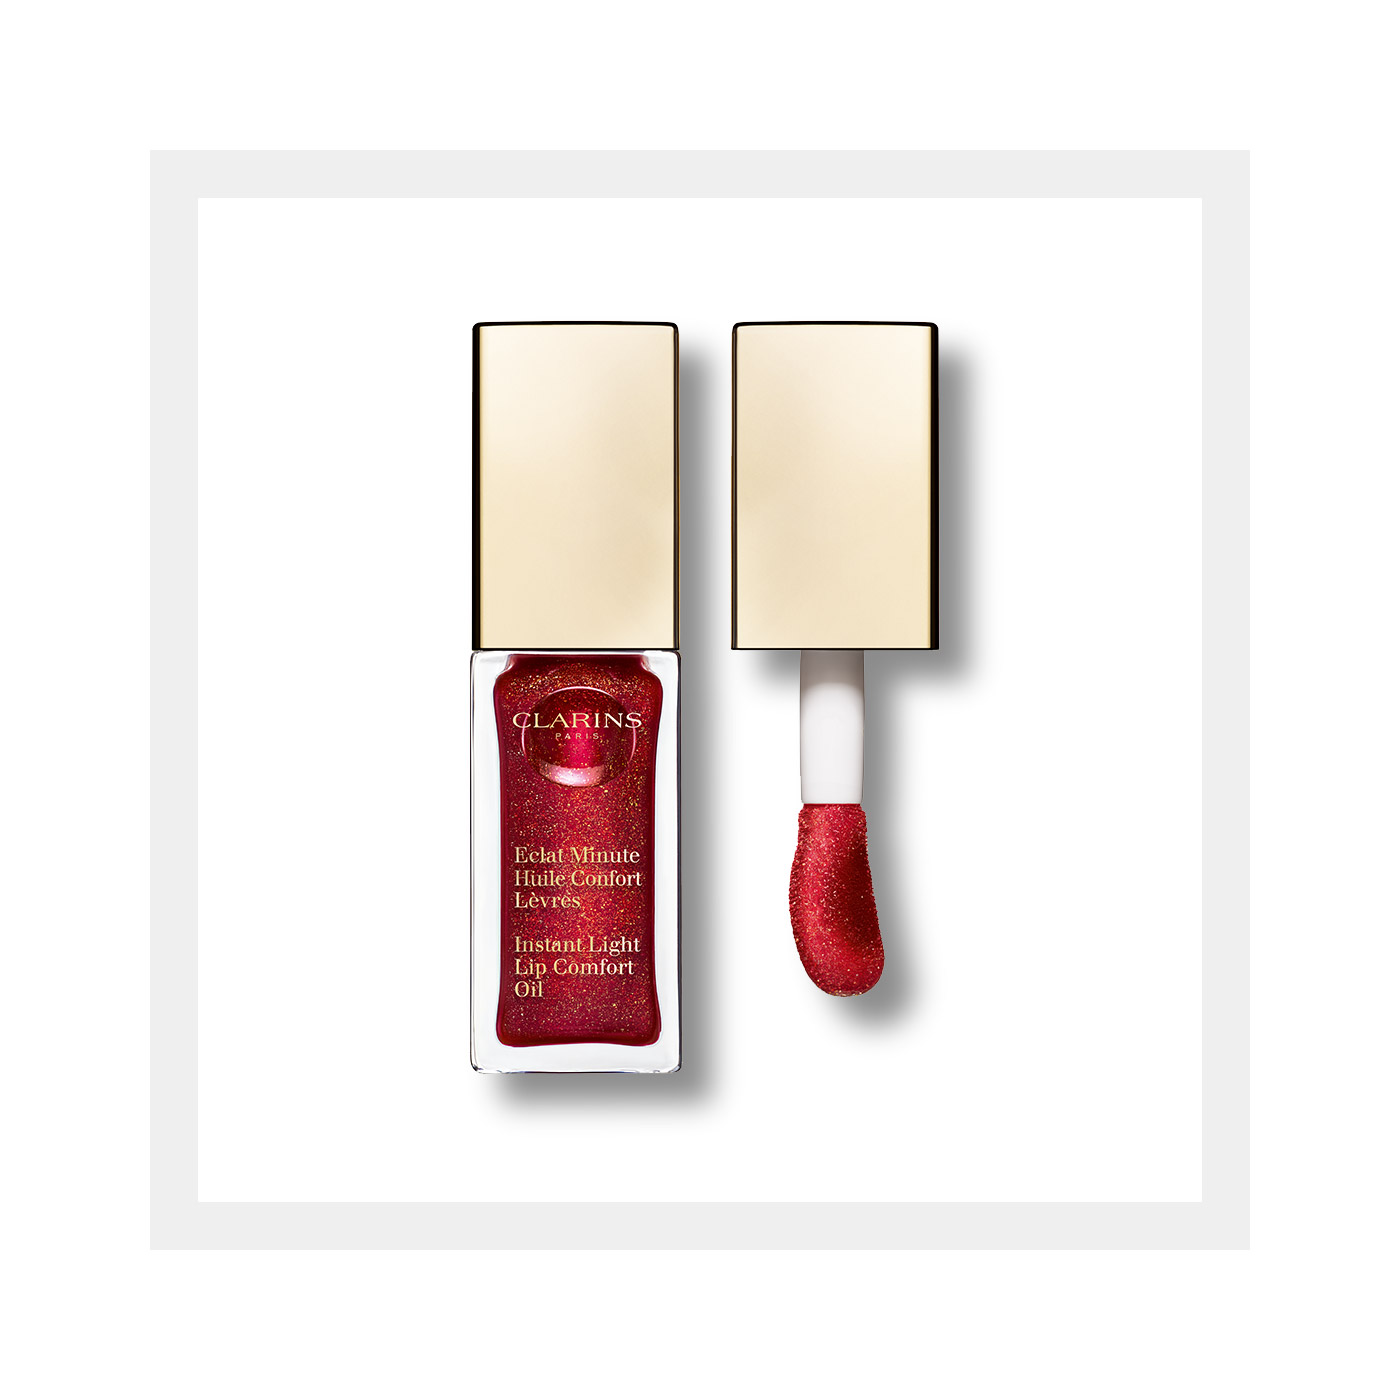 Instant Light Lip Comfort Oil Moisturizing Lip Oil Clarins